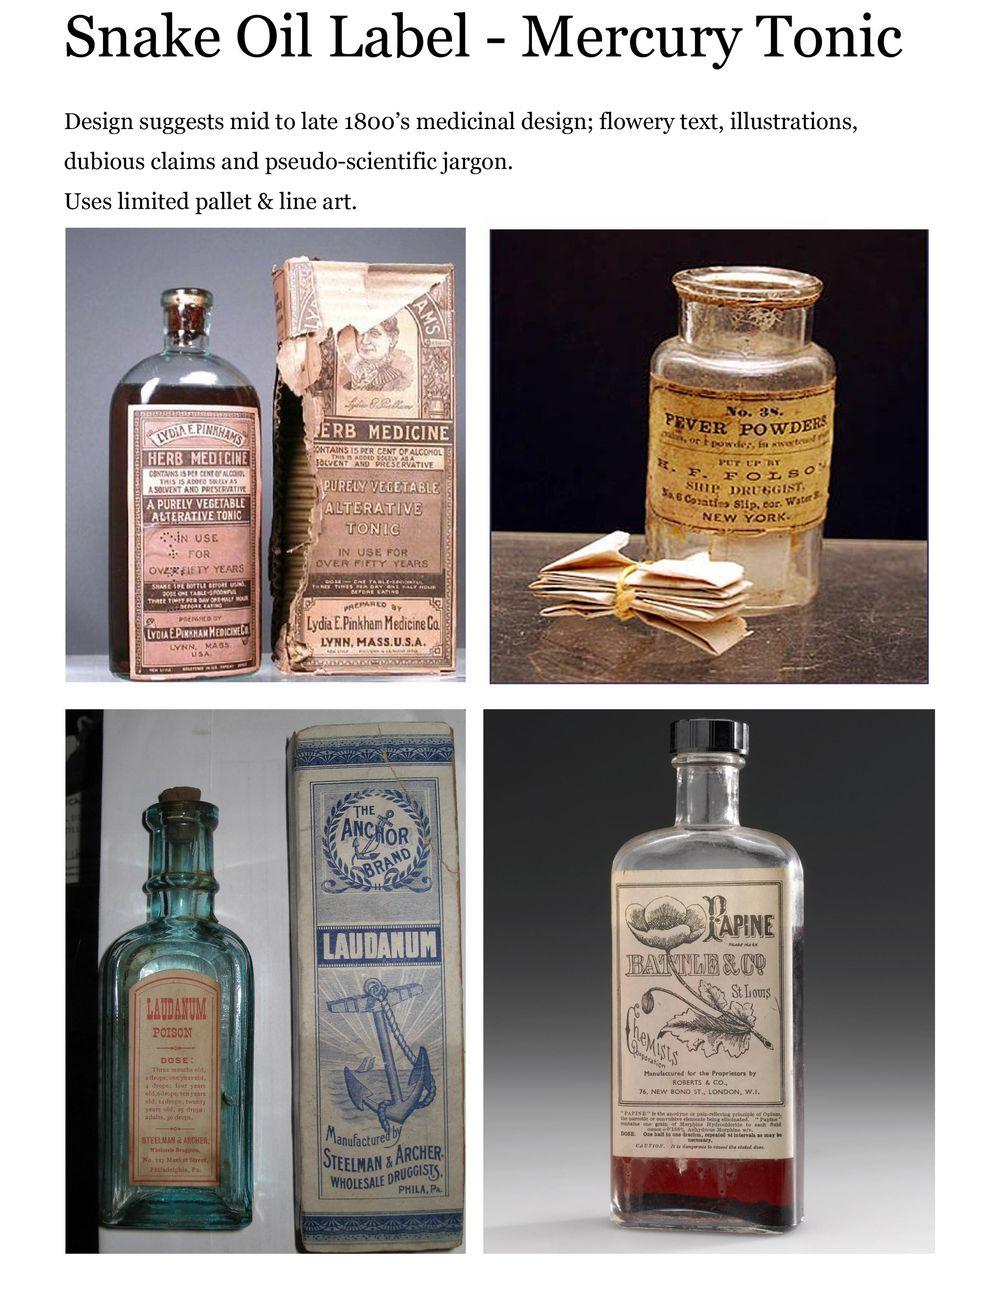 Snake Oil - Mercury Tonic - image 1 - student project